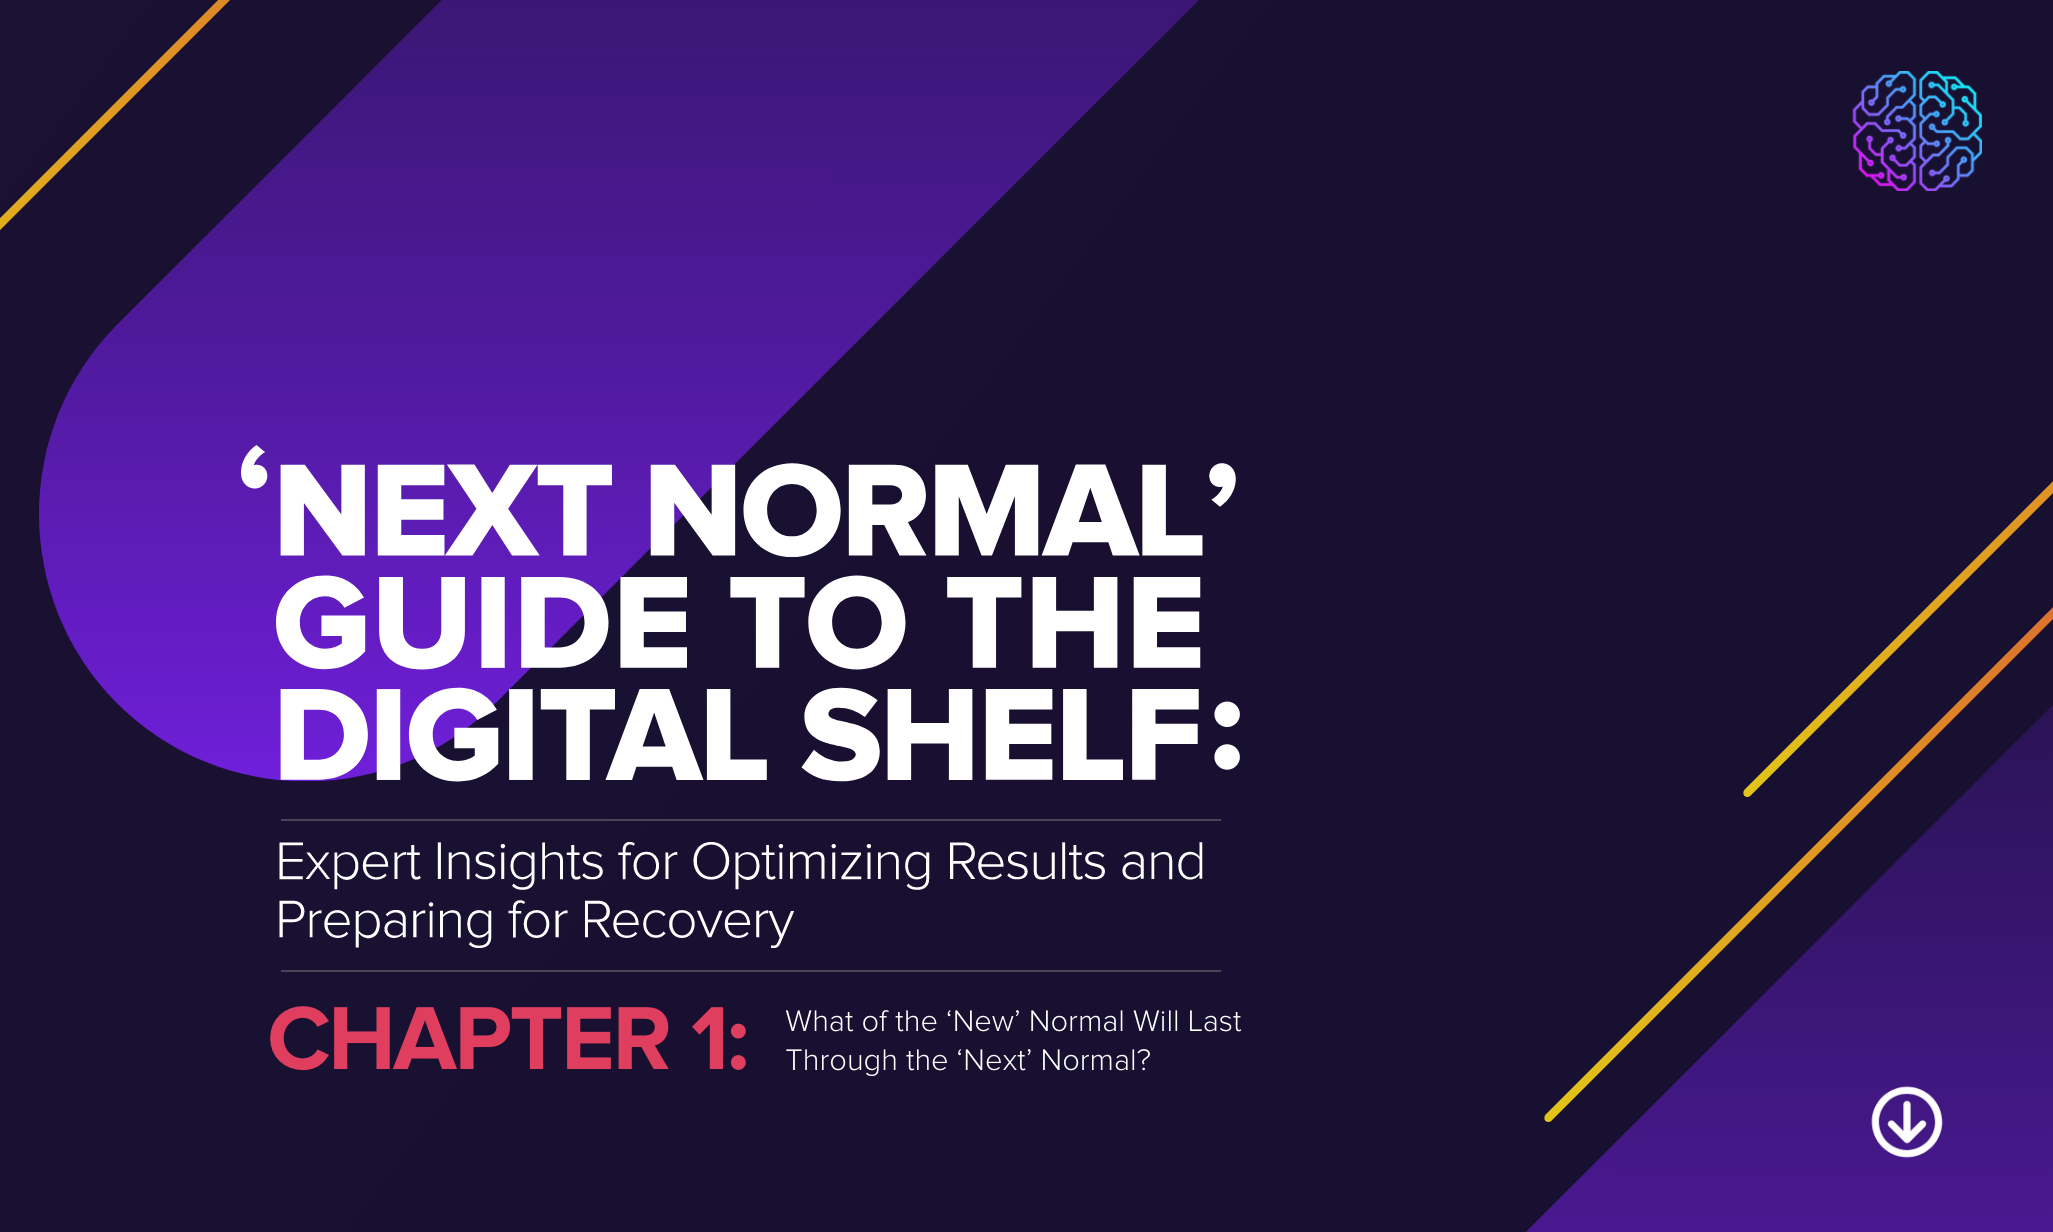 Next Normal Guide to the Digital Shelf